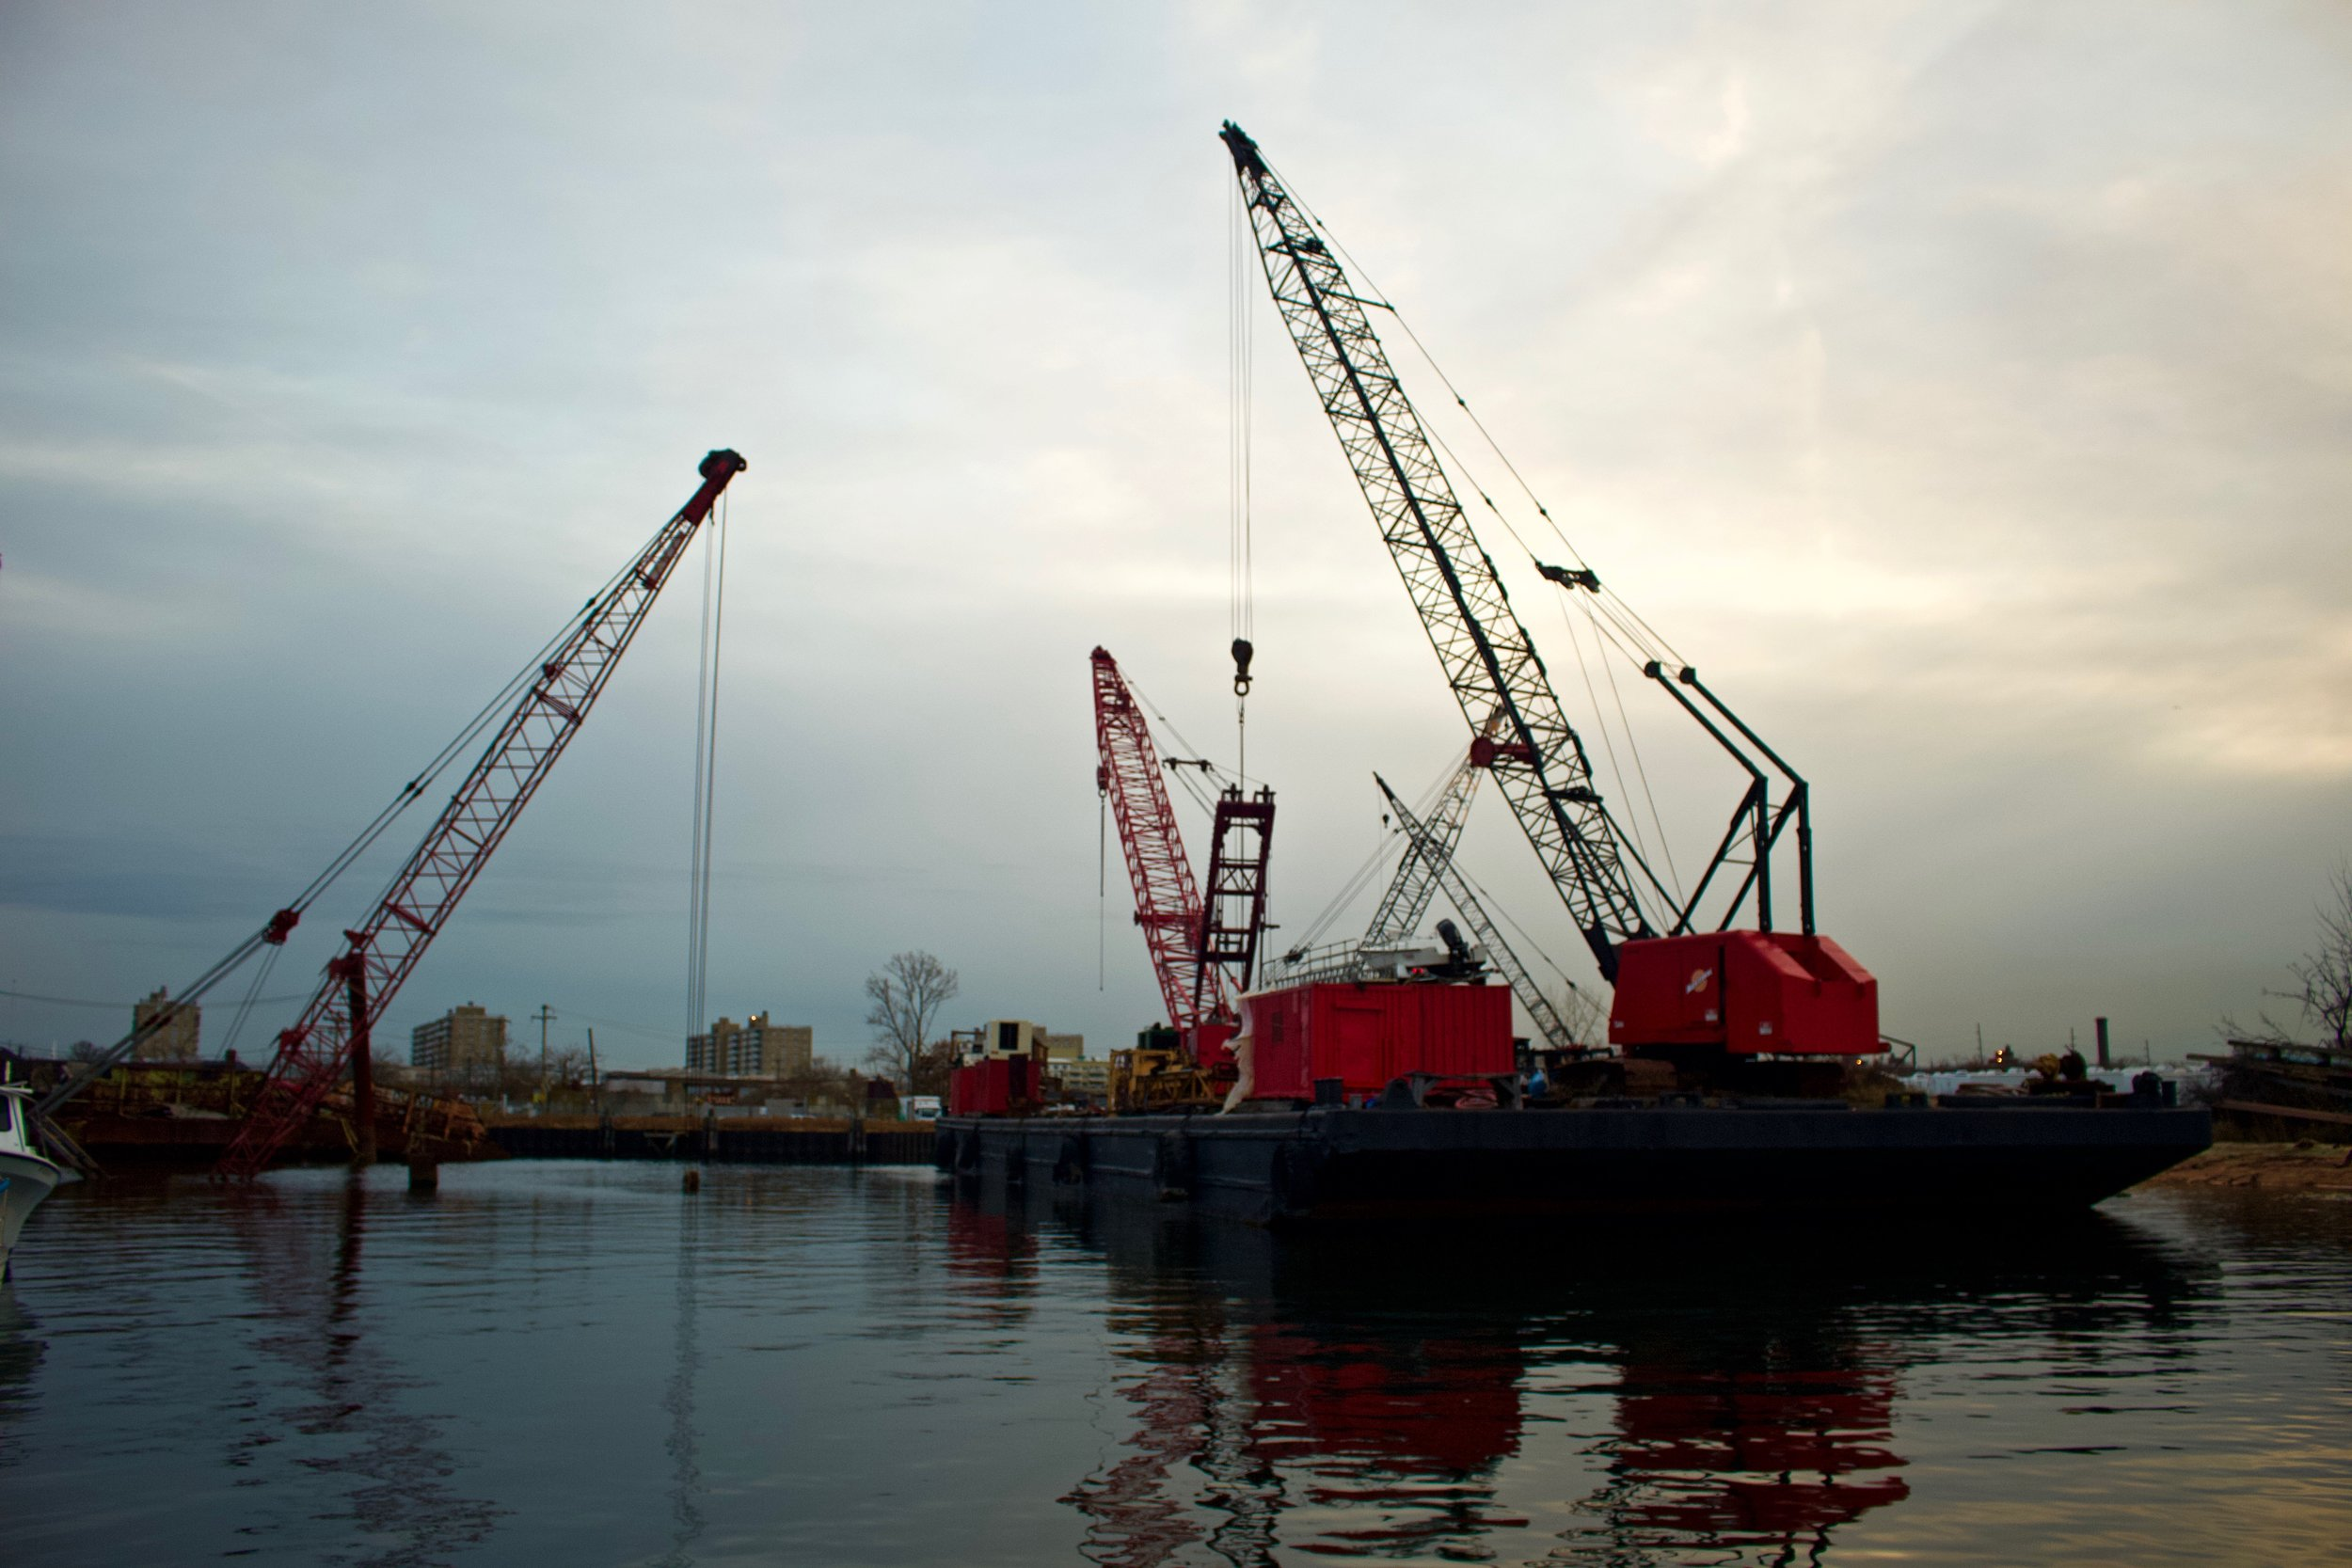 Sunken Cranes @ Marina 59 (Rockaway Beach)